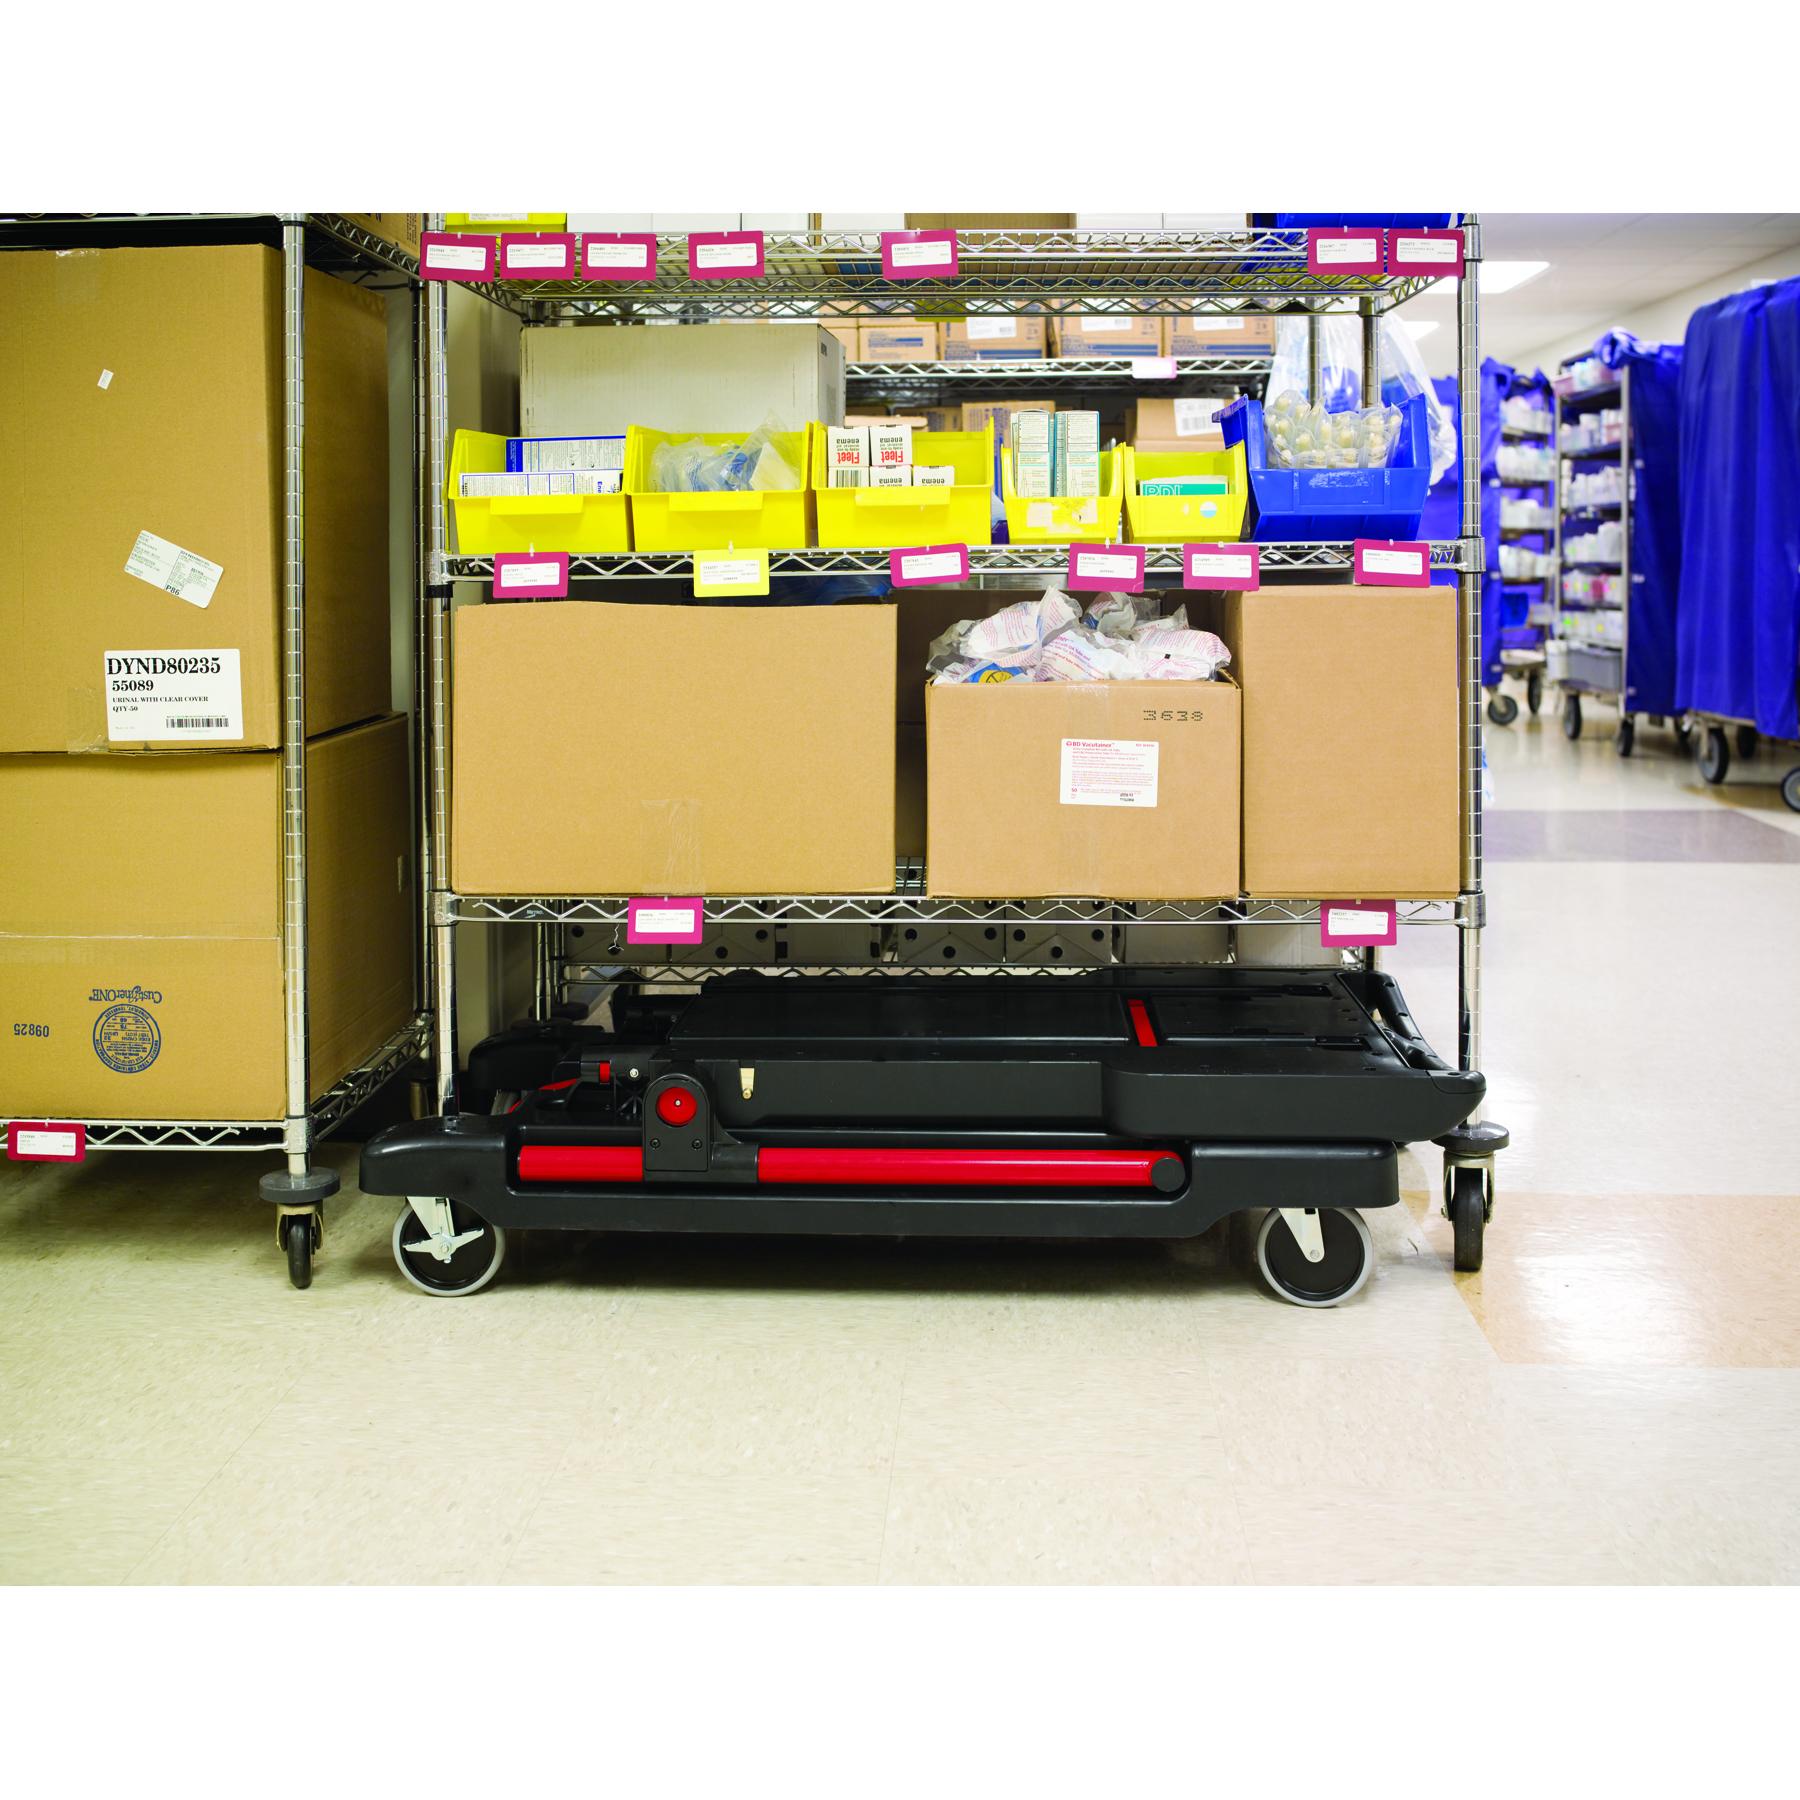 convertible utility cart - Rubbermaid Utility Cart